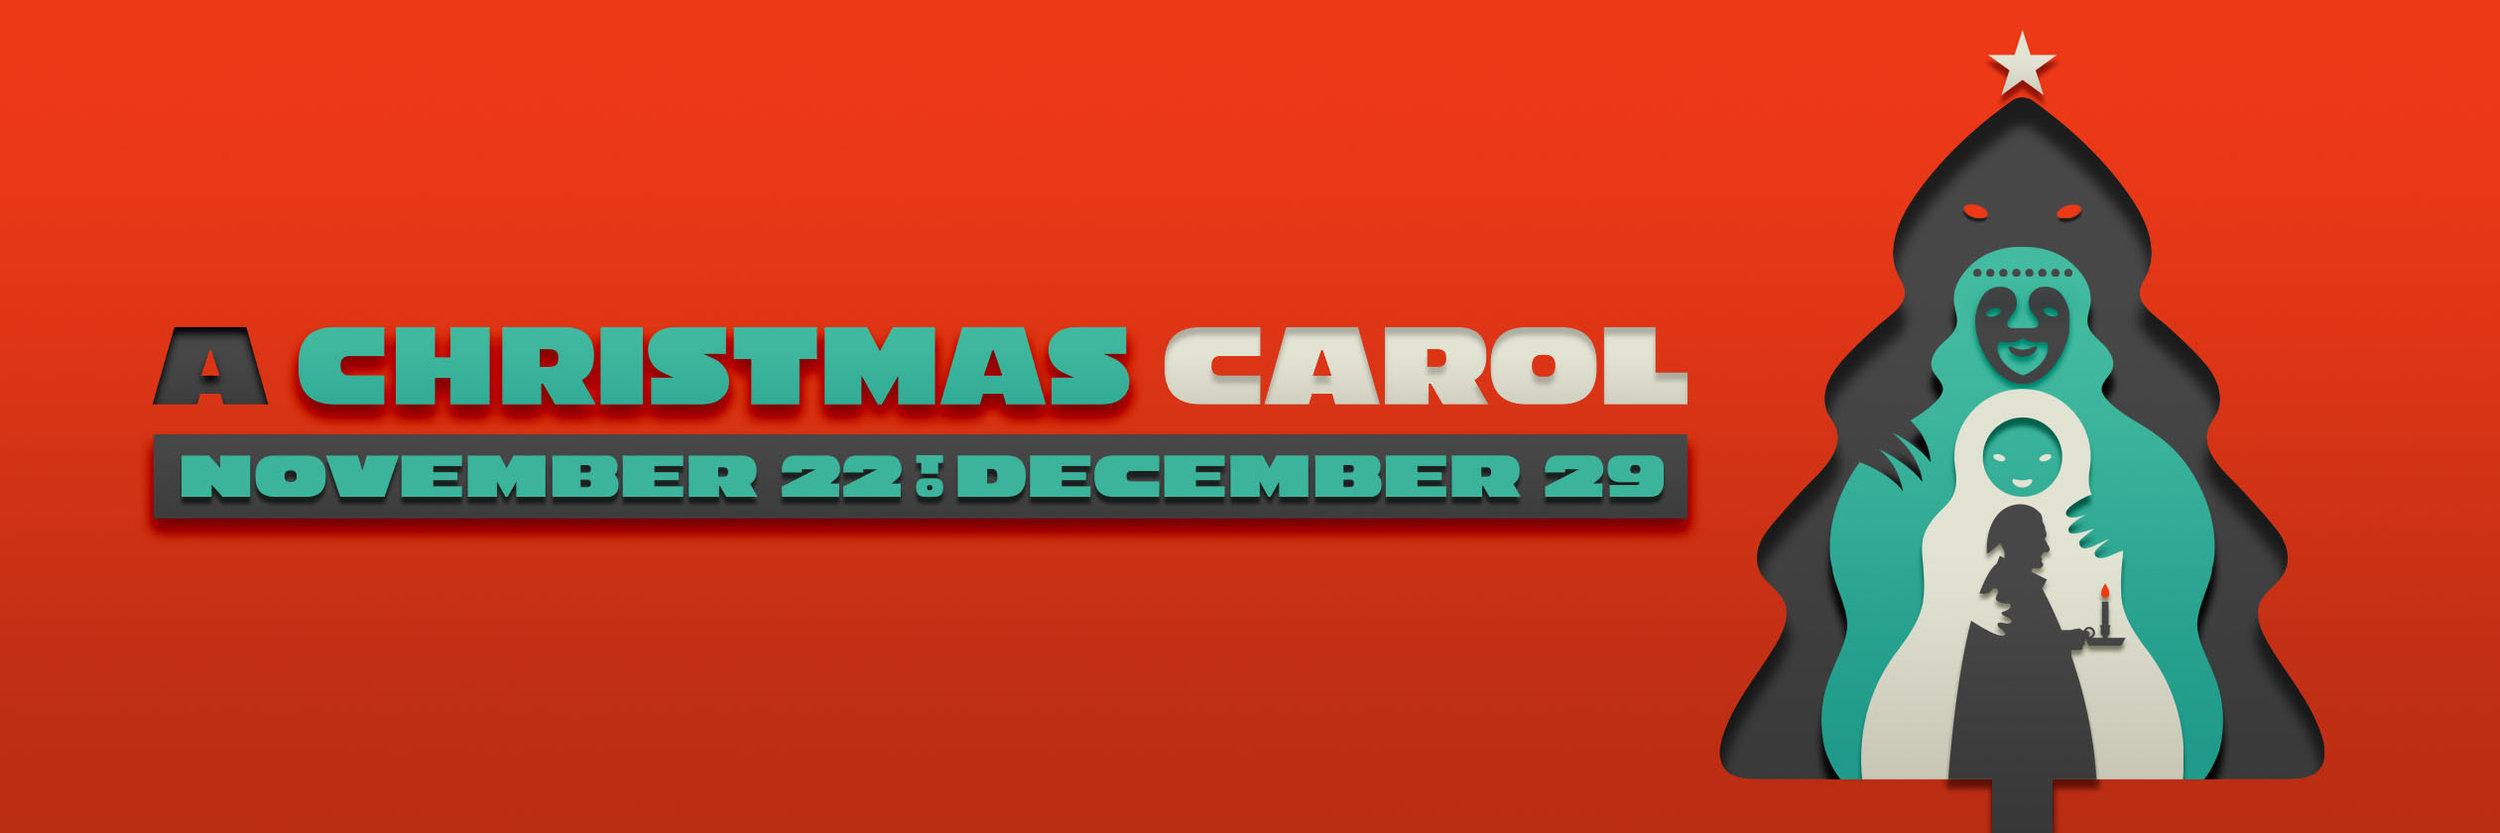 DTC-A-Christmas-Carol-1260x420-CDates (1).jpg